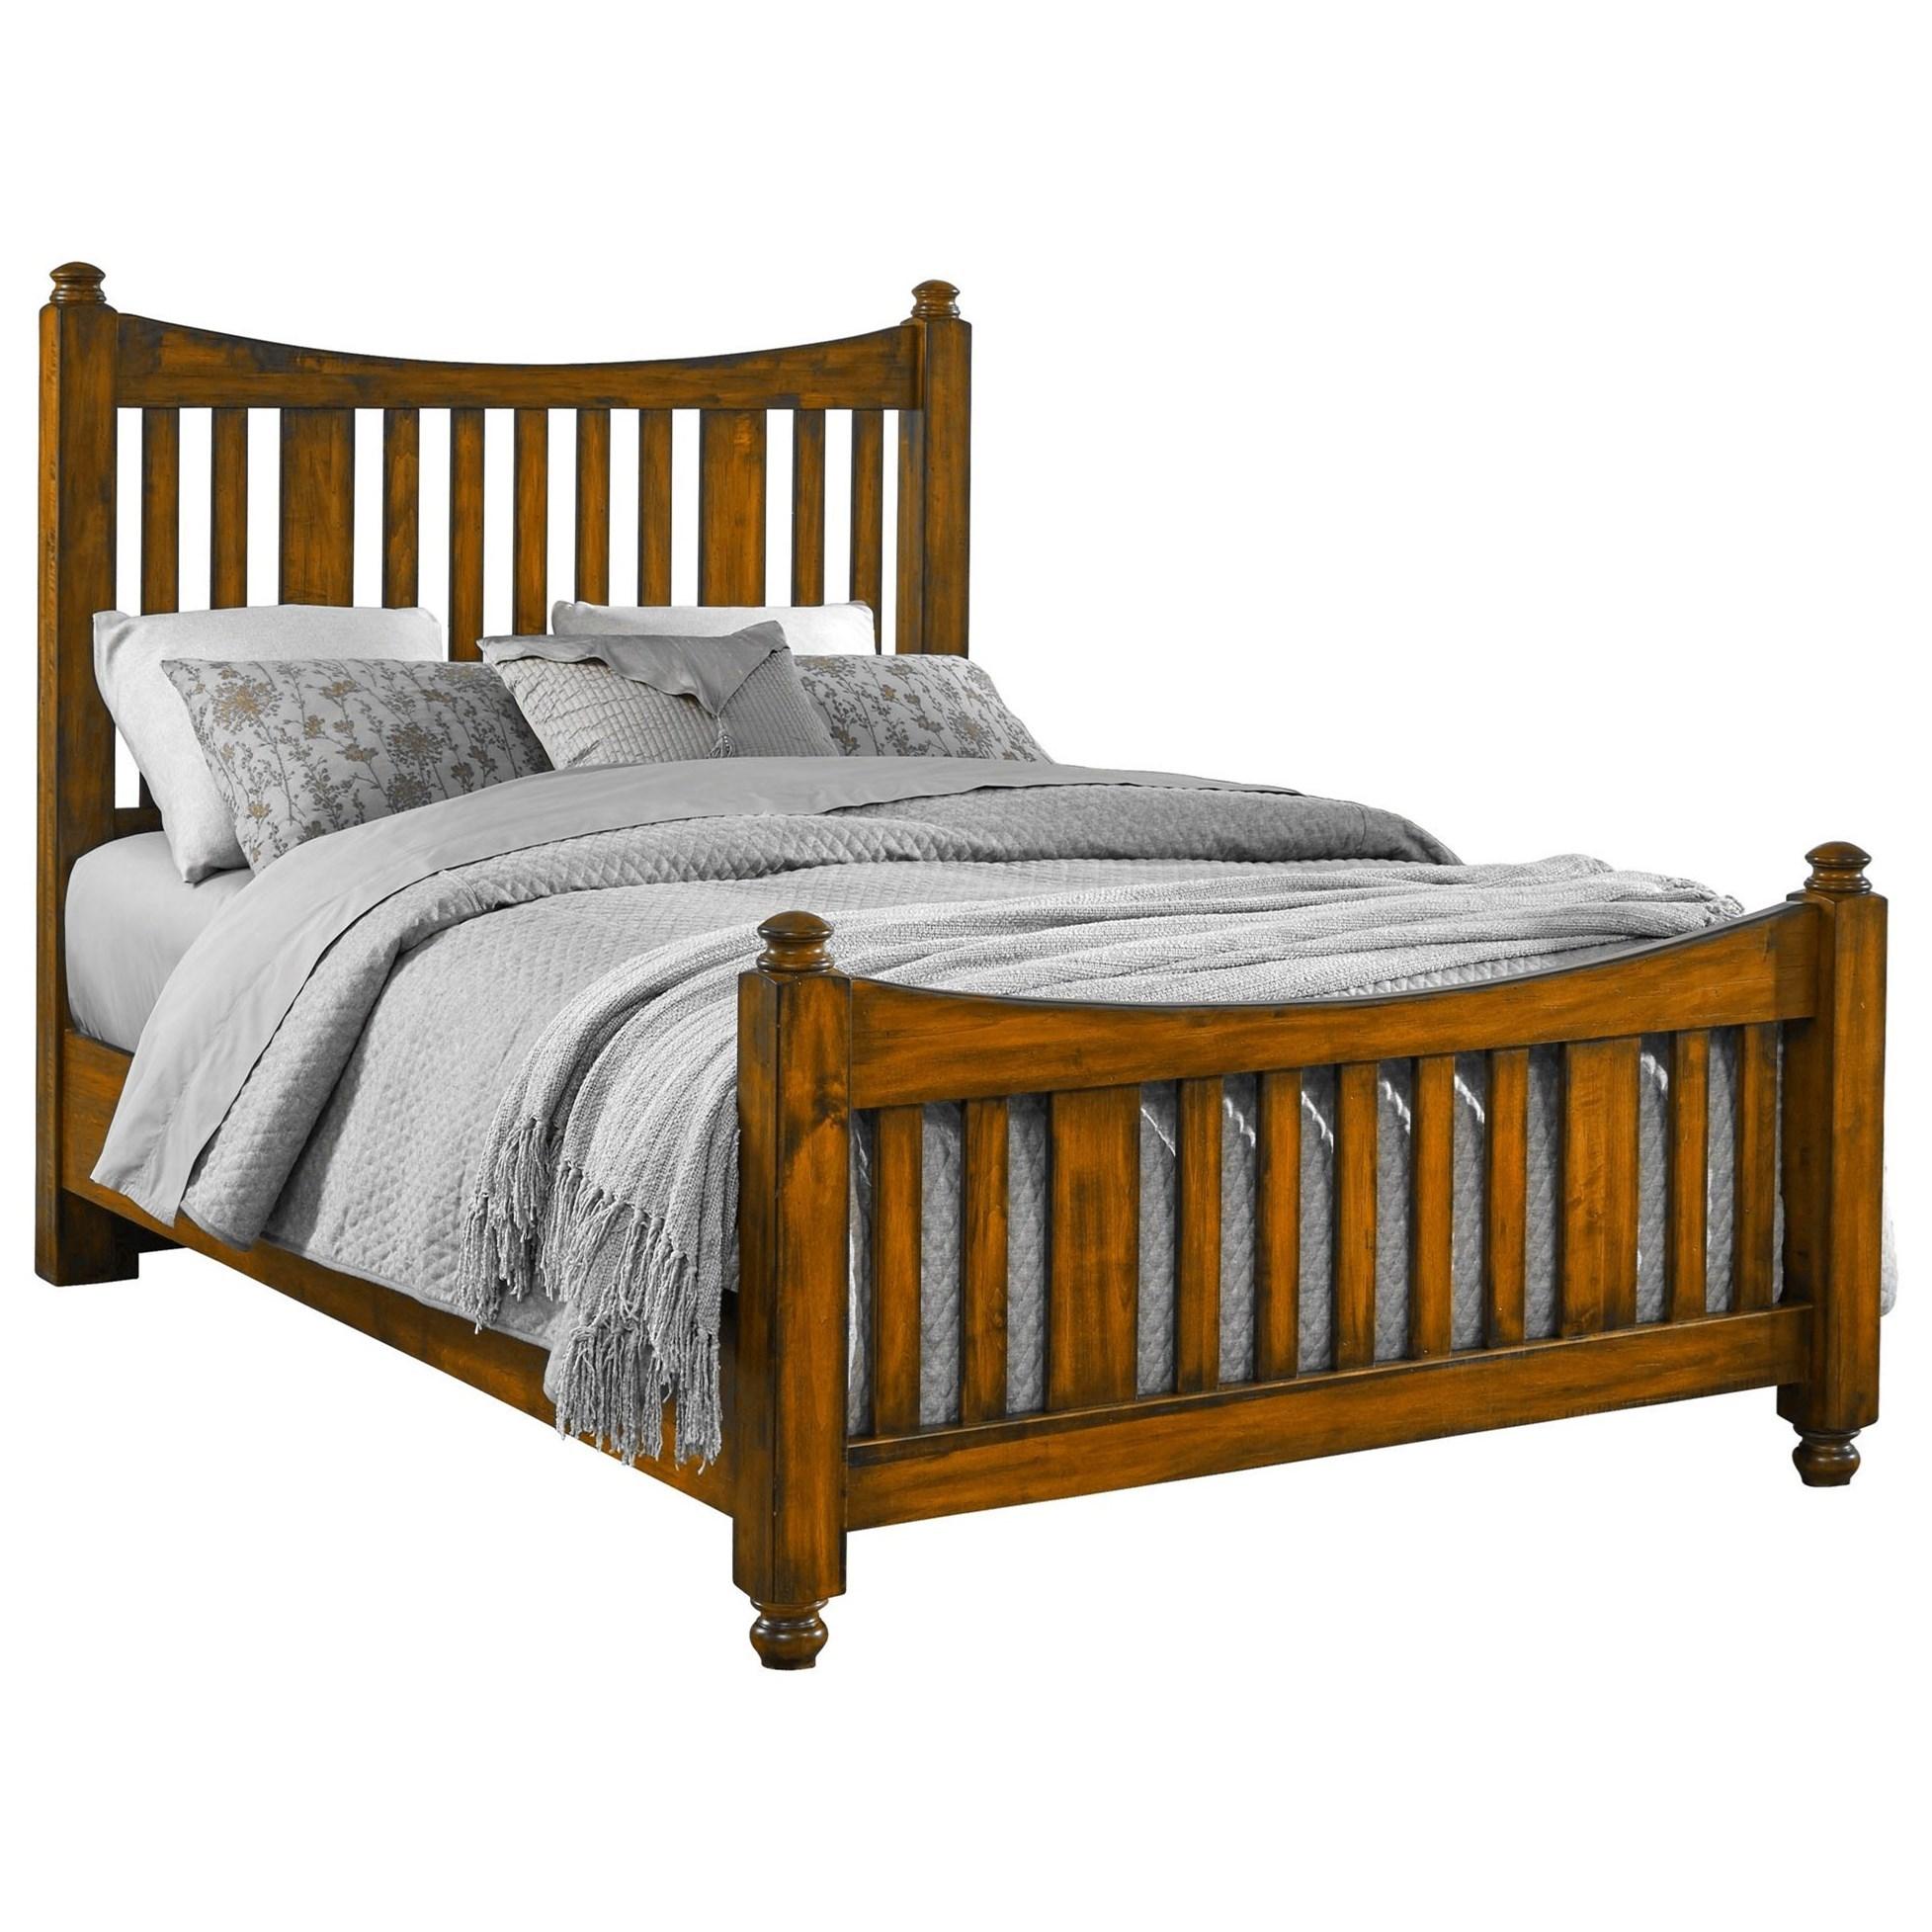 Artisan & Post Maple Road King Slat Poster Bed - Item Number: 118-668+866+733